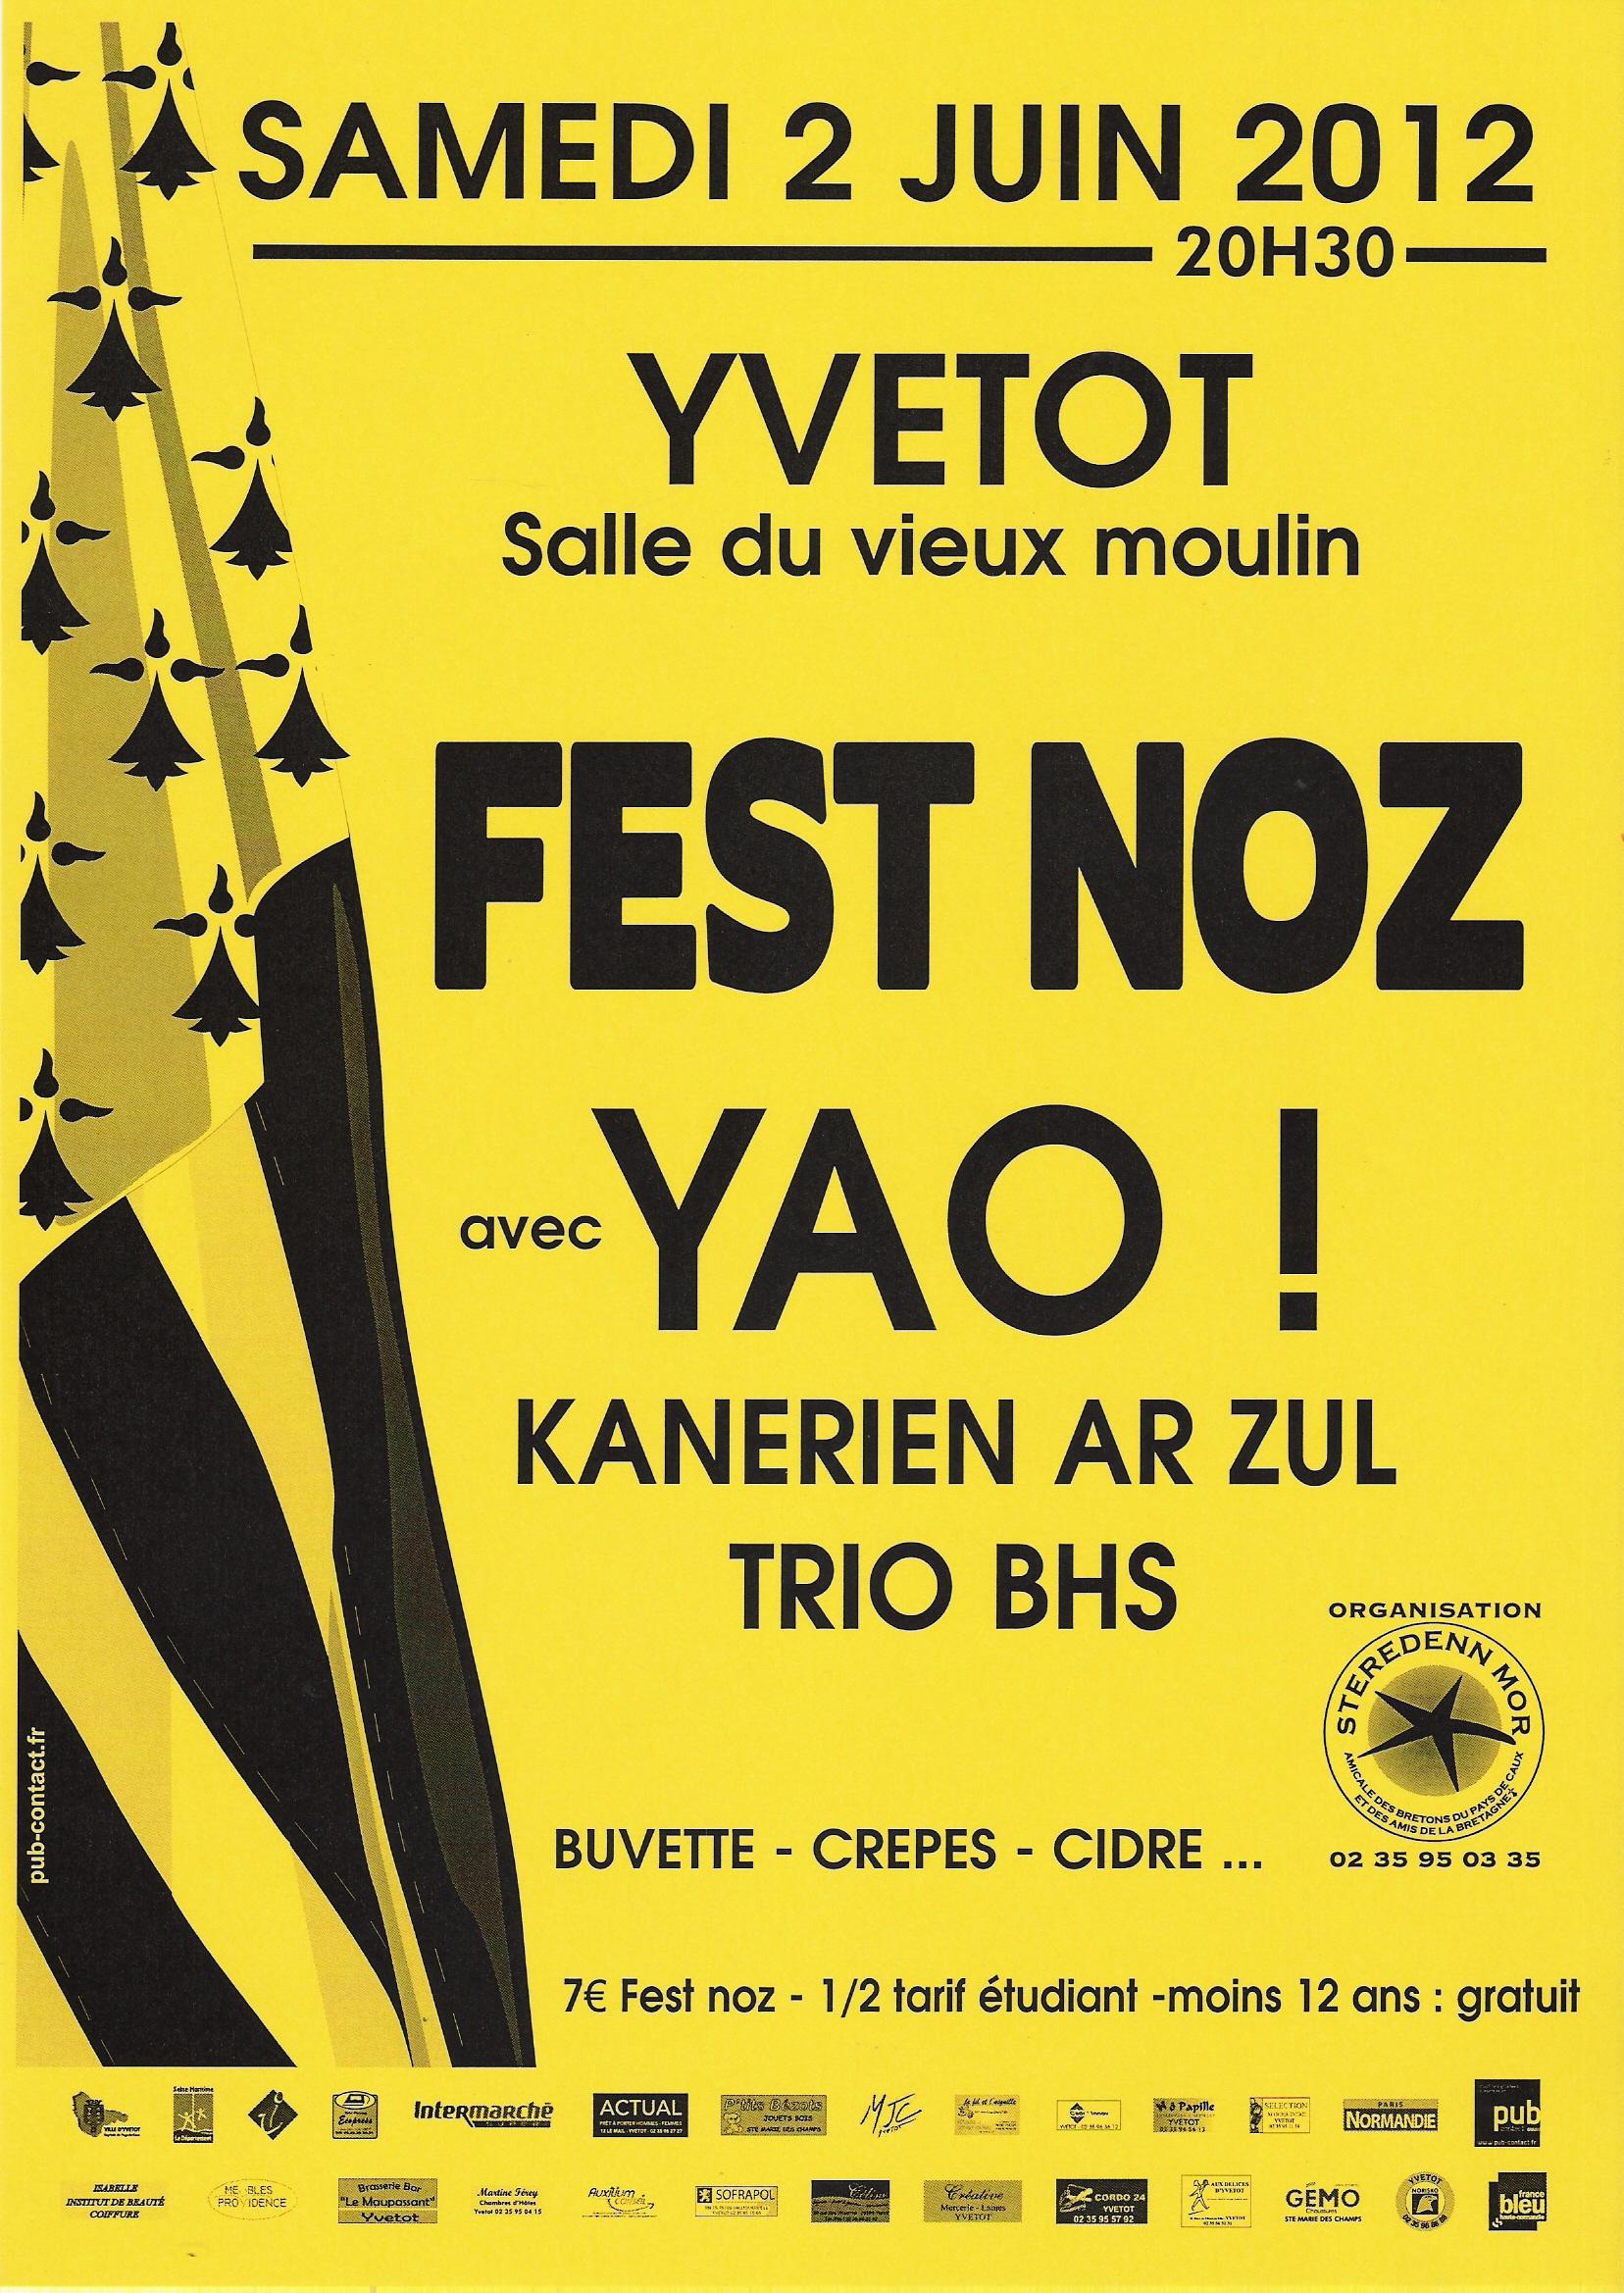 Fest-noz avec Yao samedi 2 juin à Yvetot (76190)